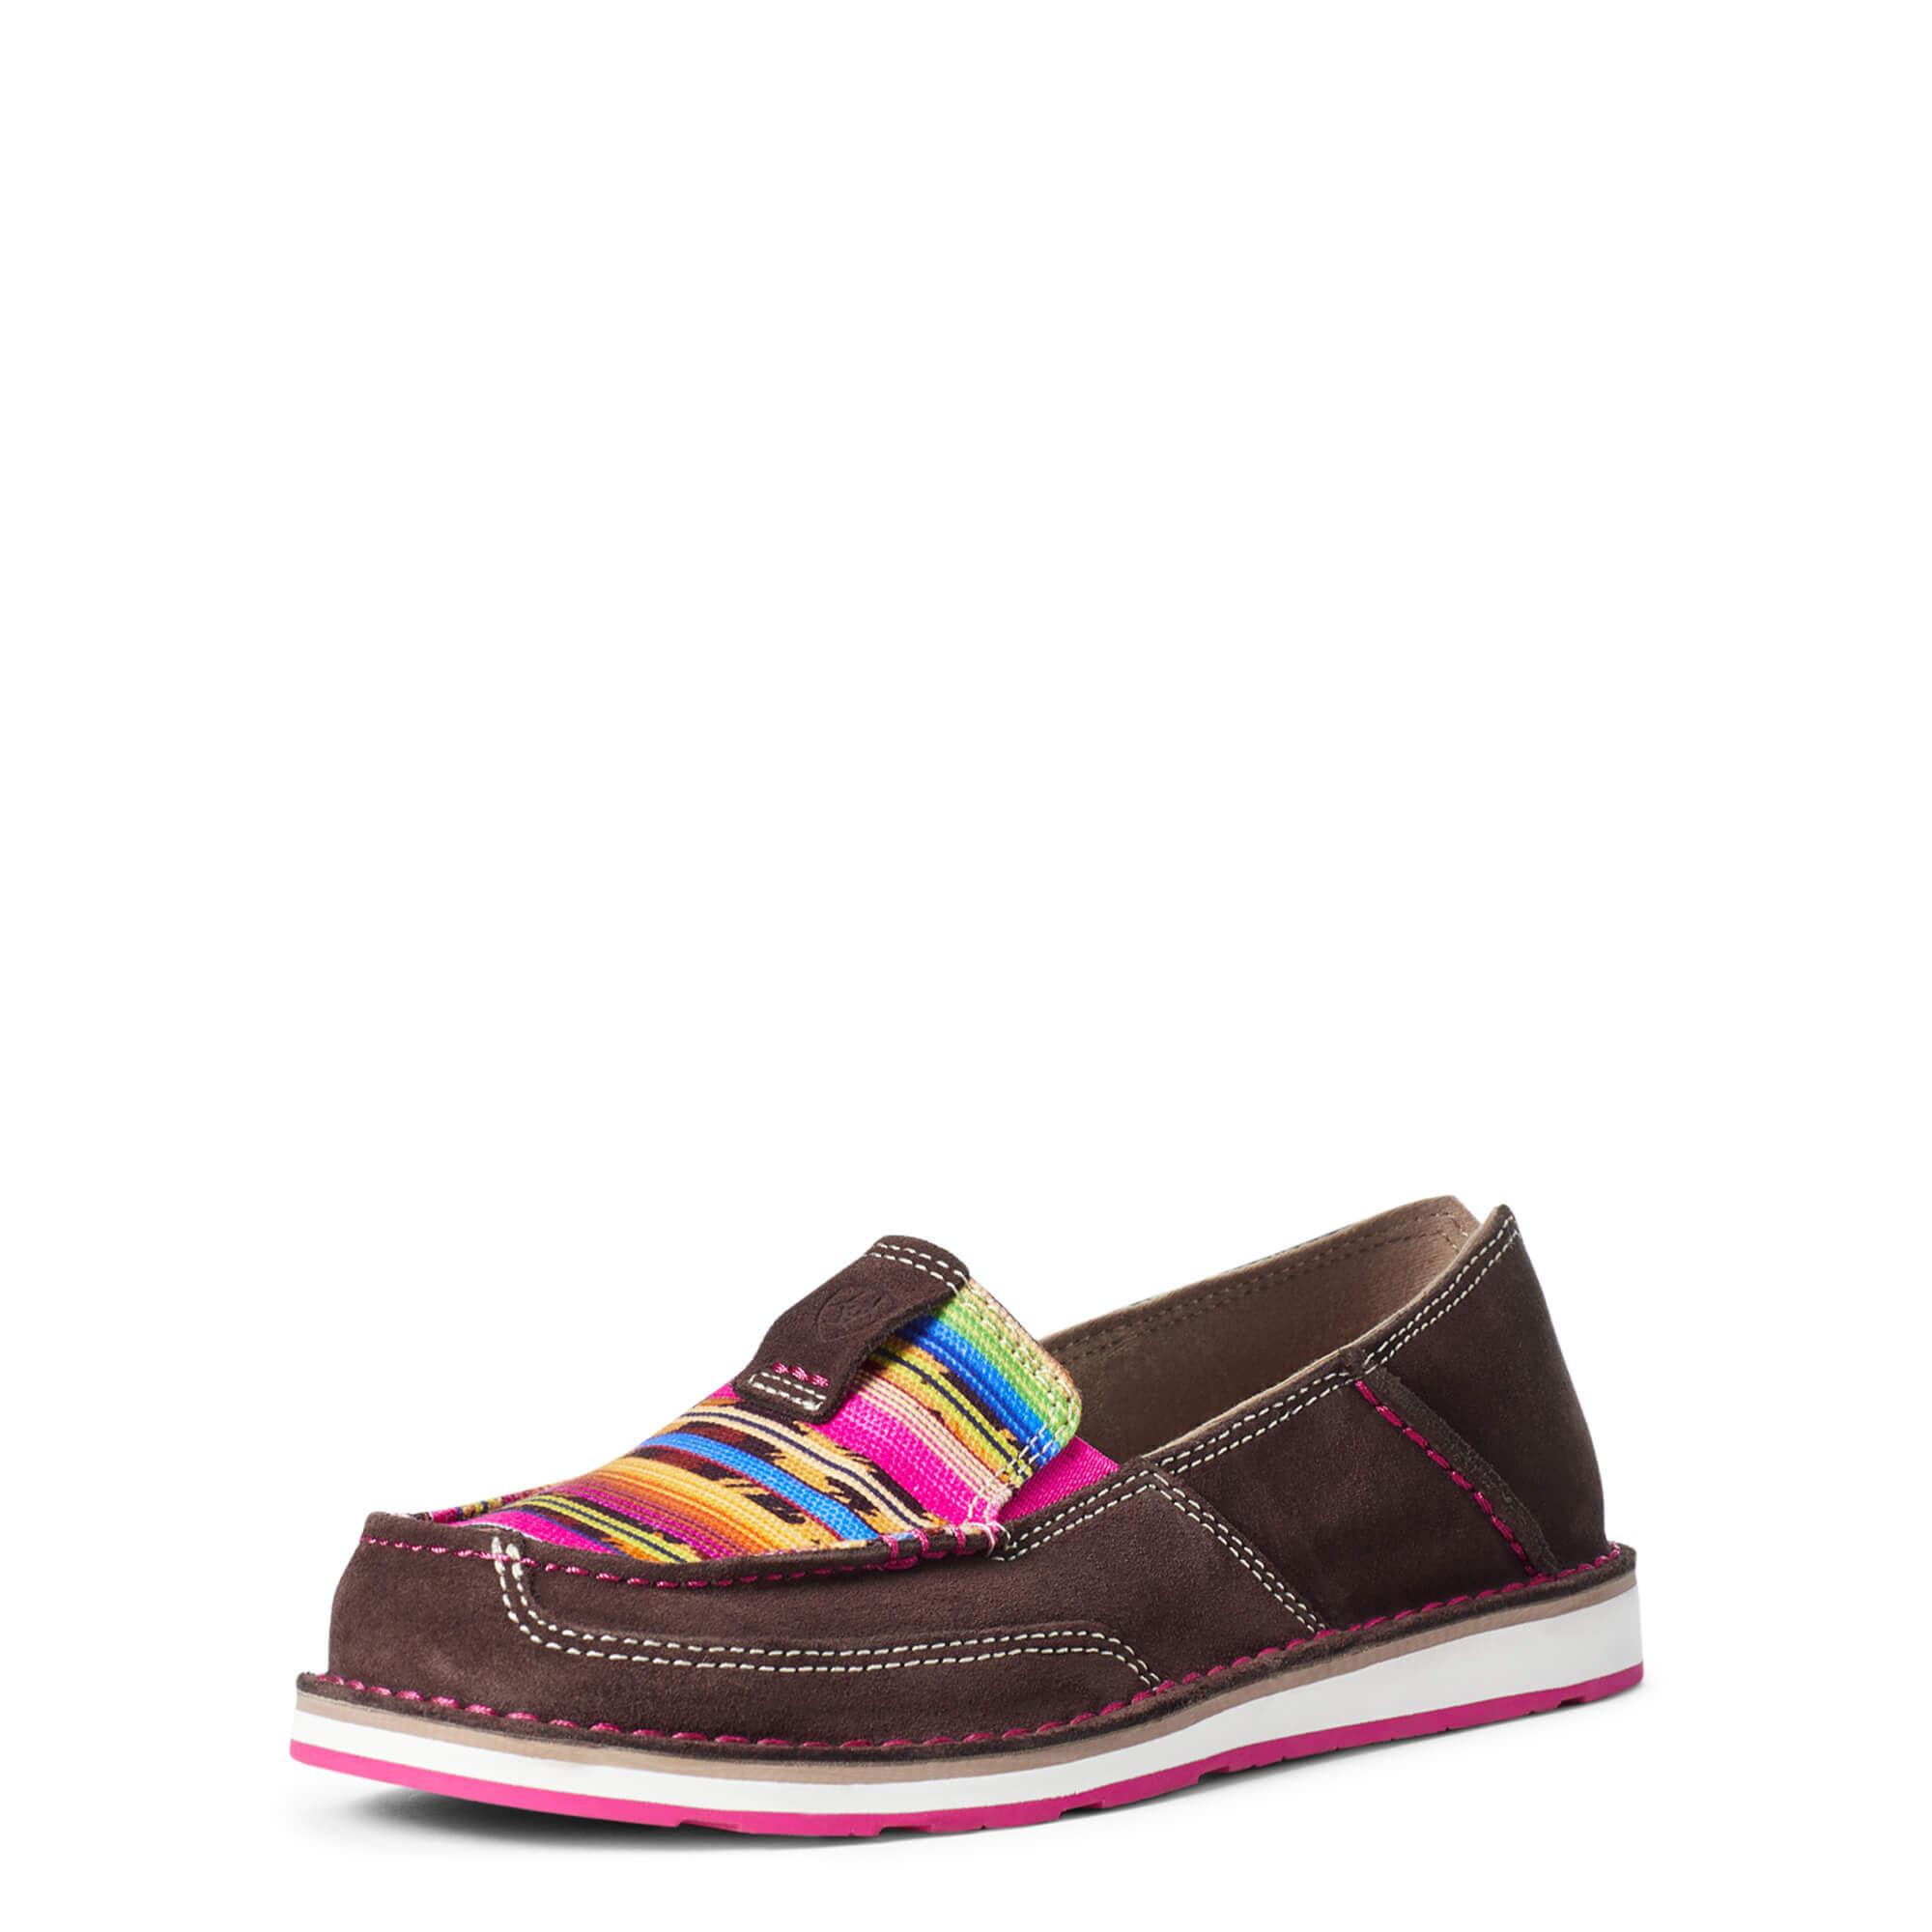 Ariat Women's Cruiser Shoes in Coffee Bean Suede Cheetah Serape Leather, Size 6 B / Medium by Ariat